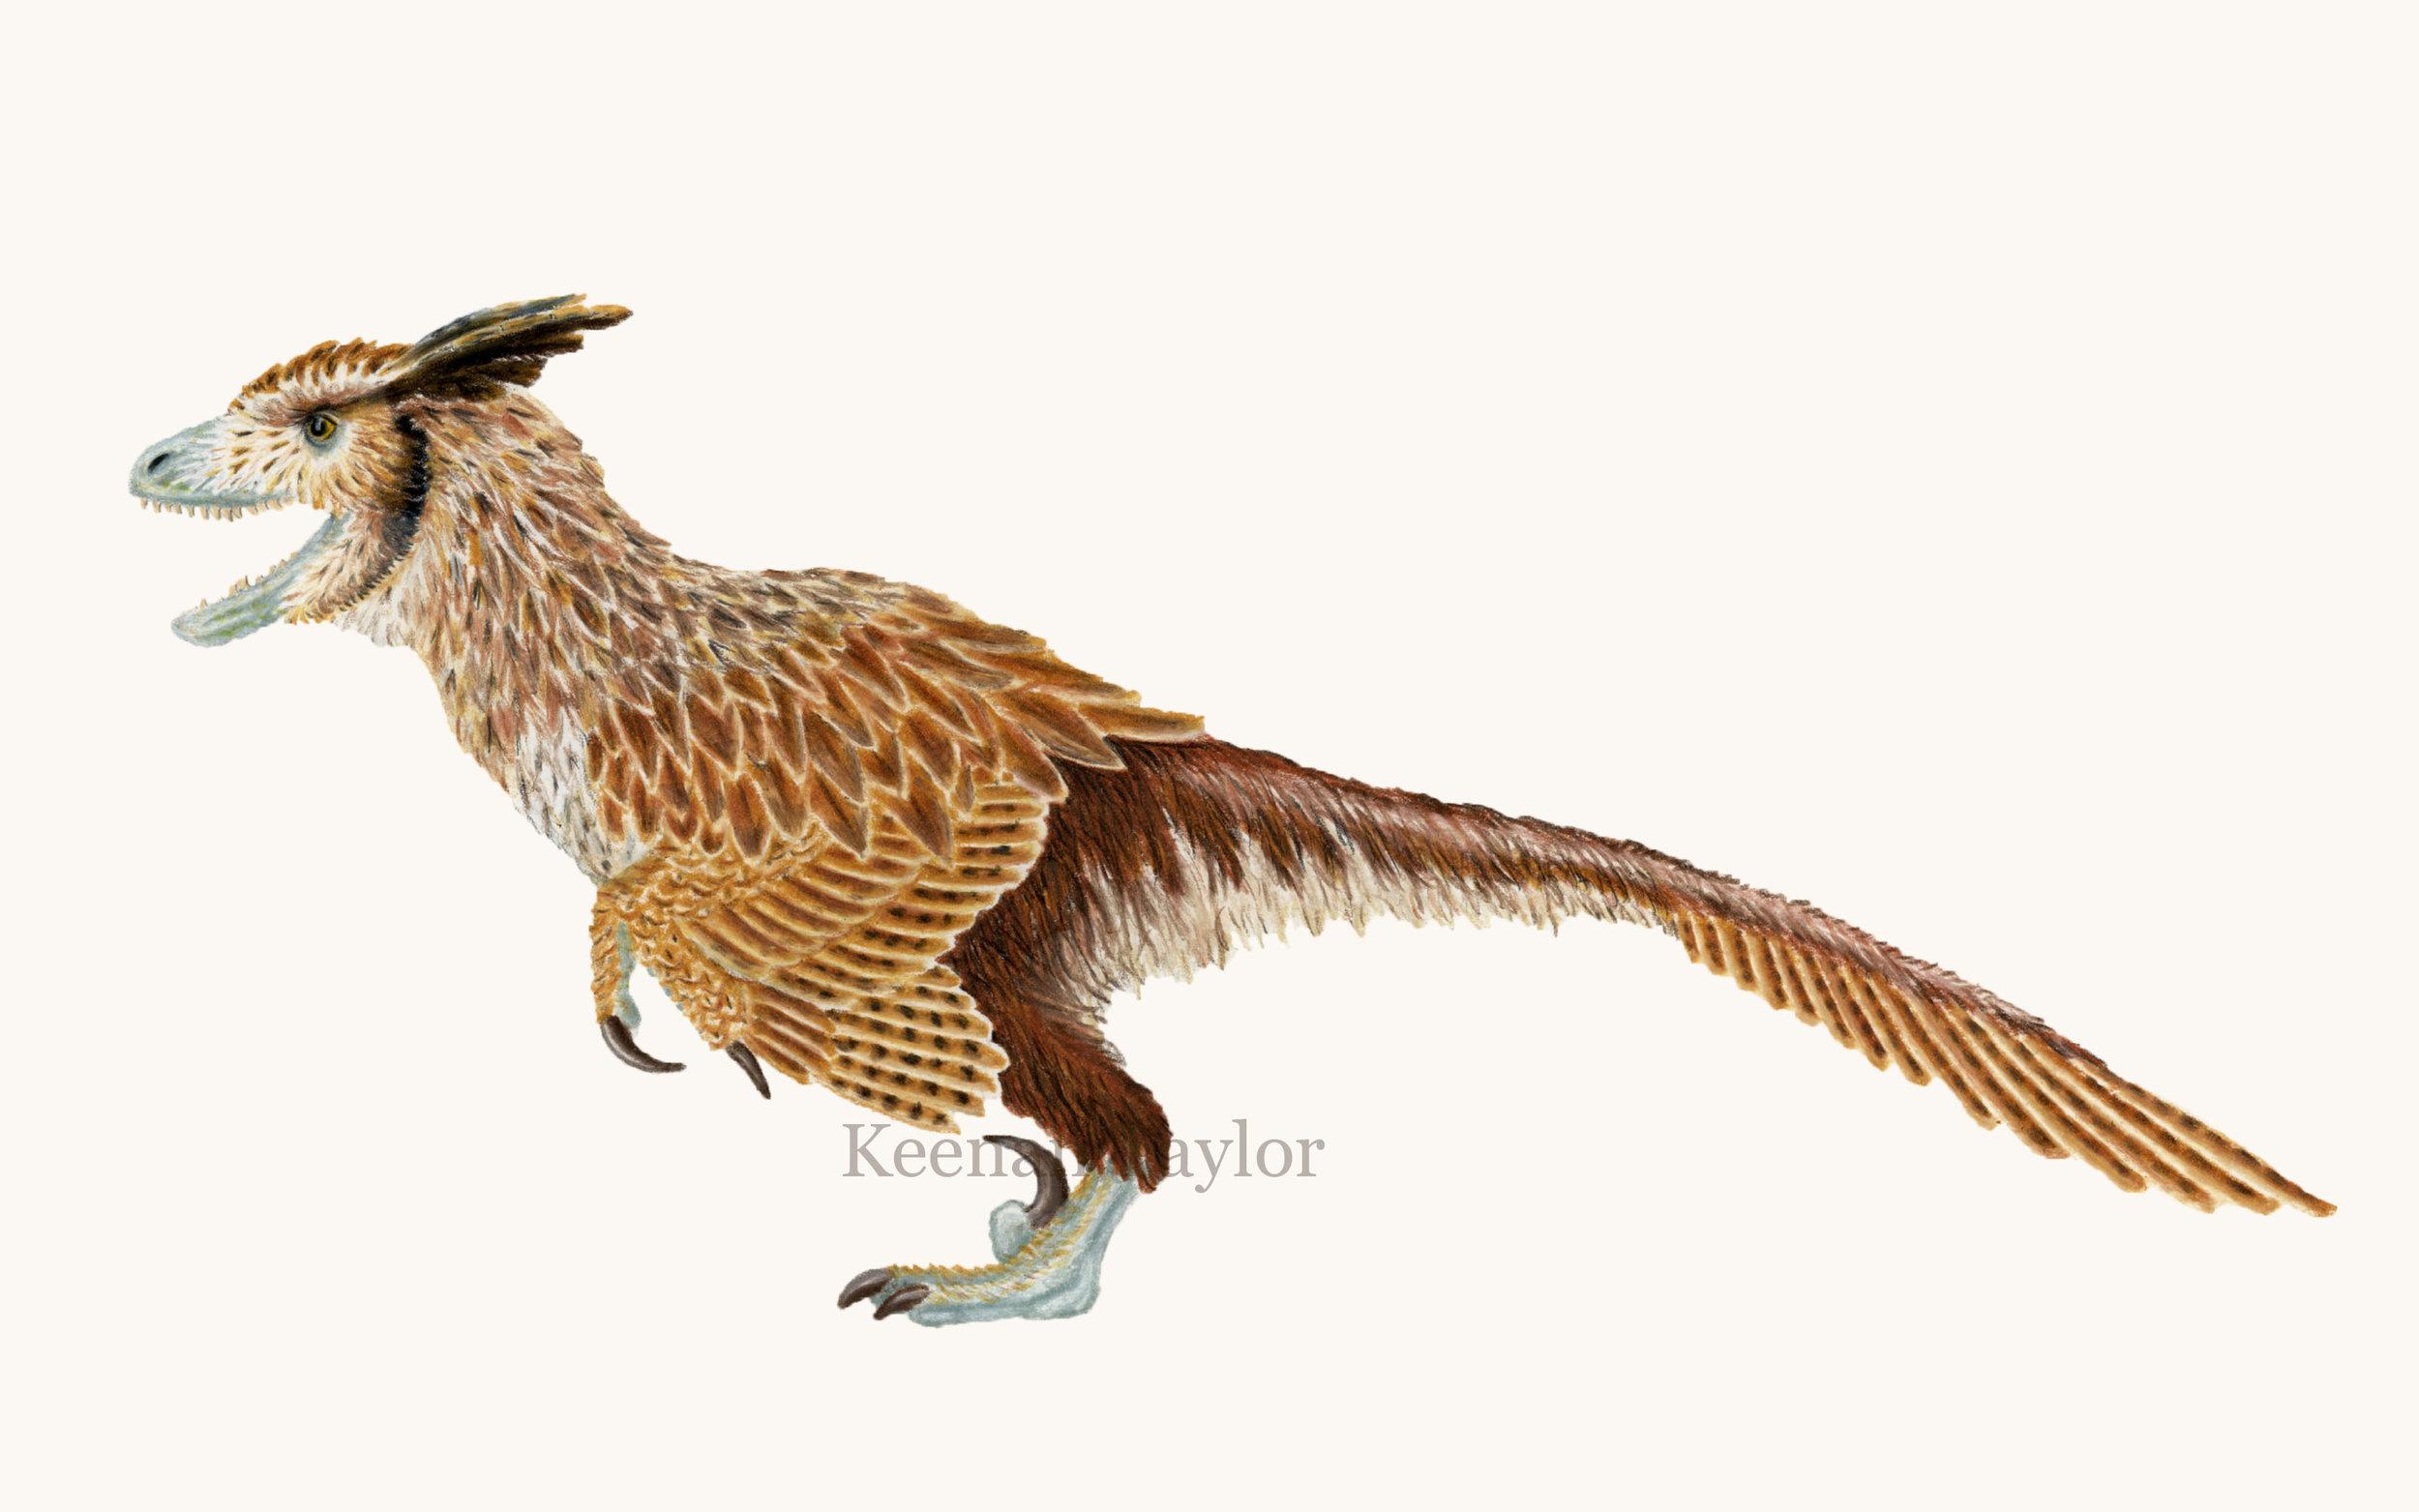 Deinonychus antirrhopus (great horned owl)